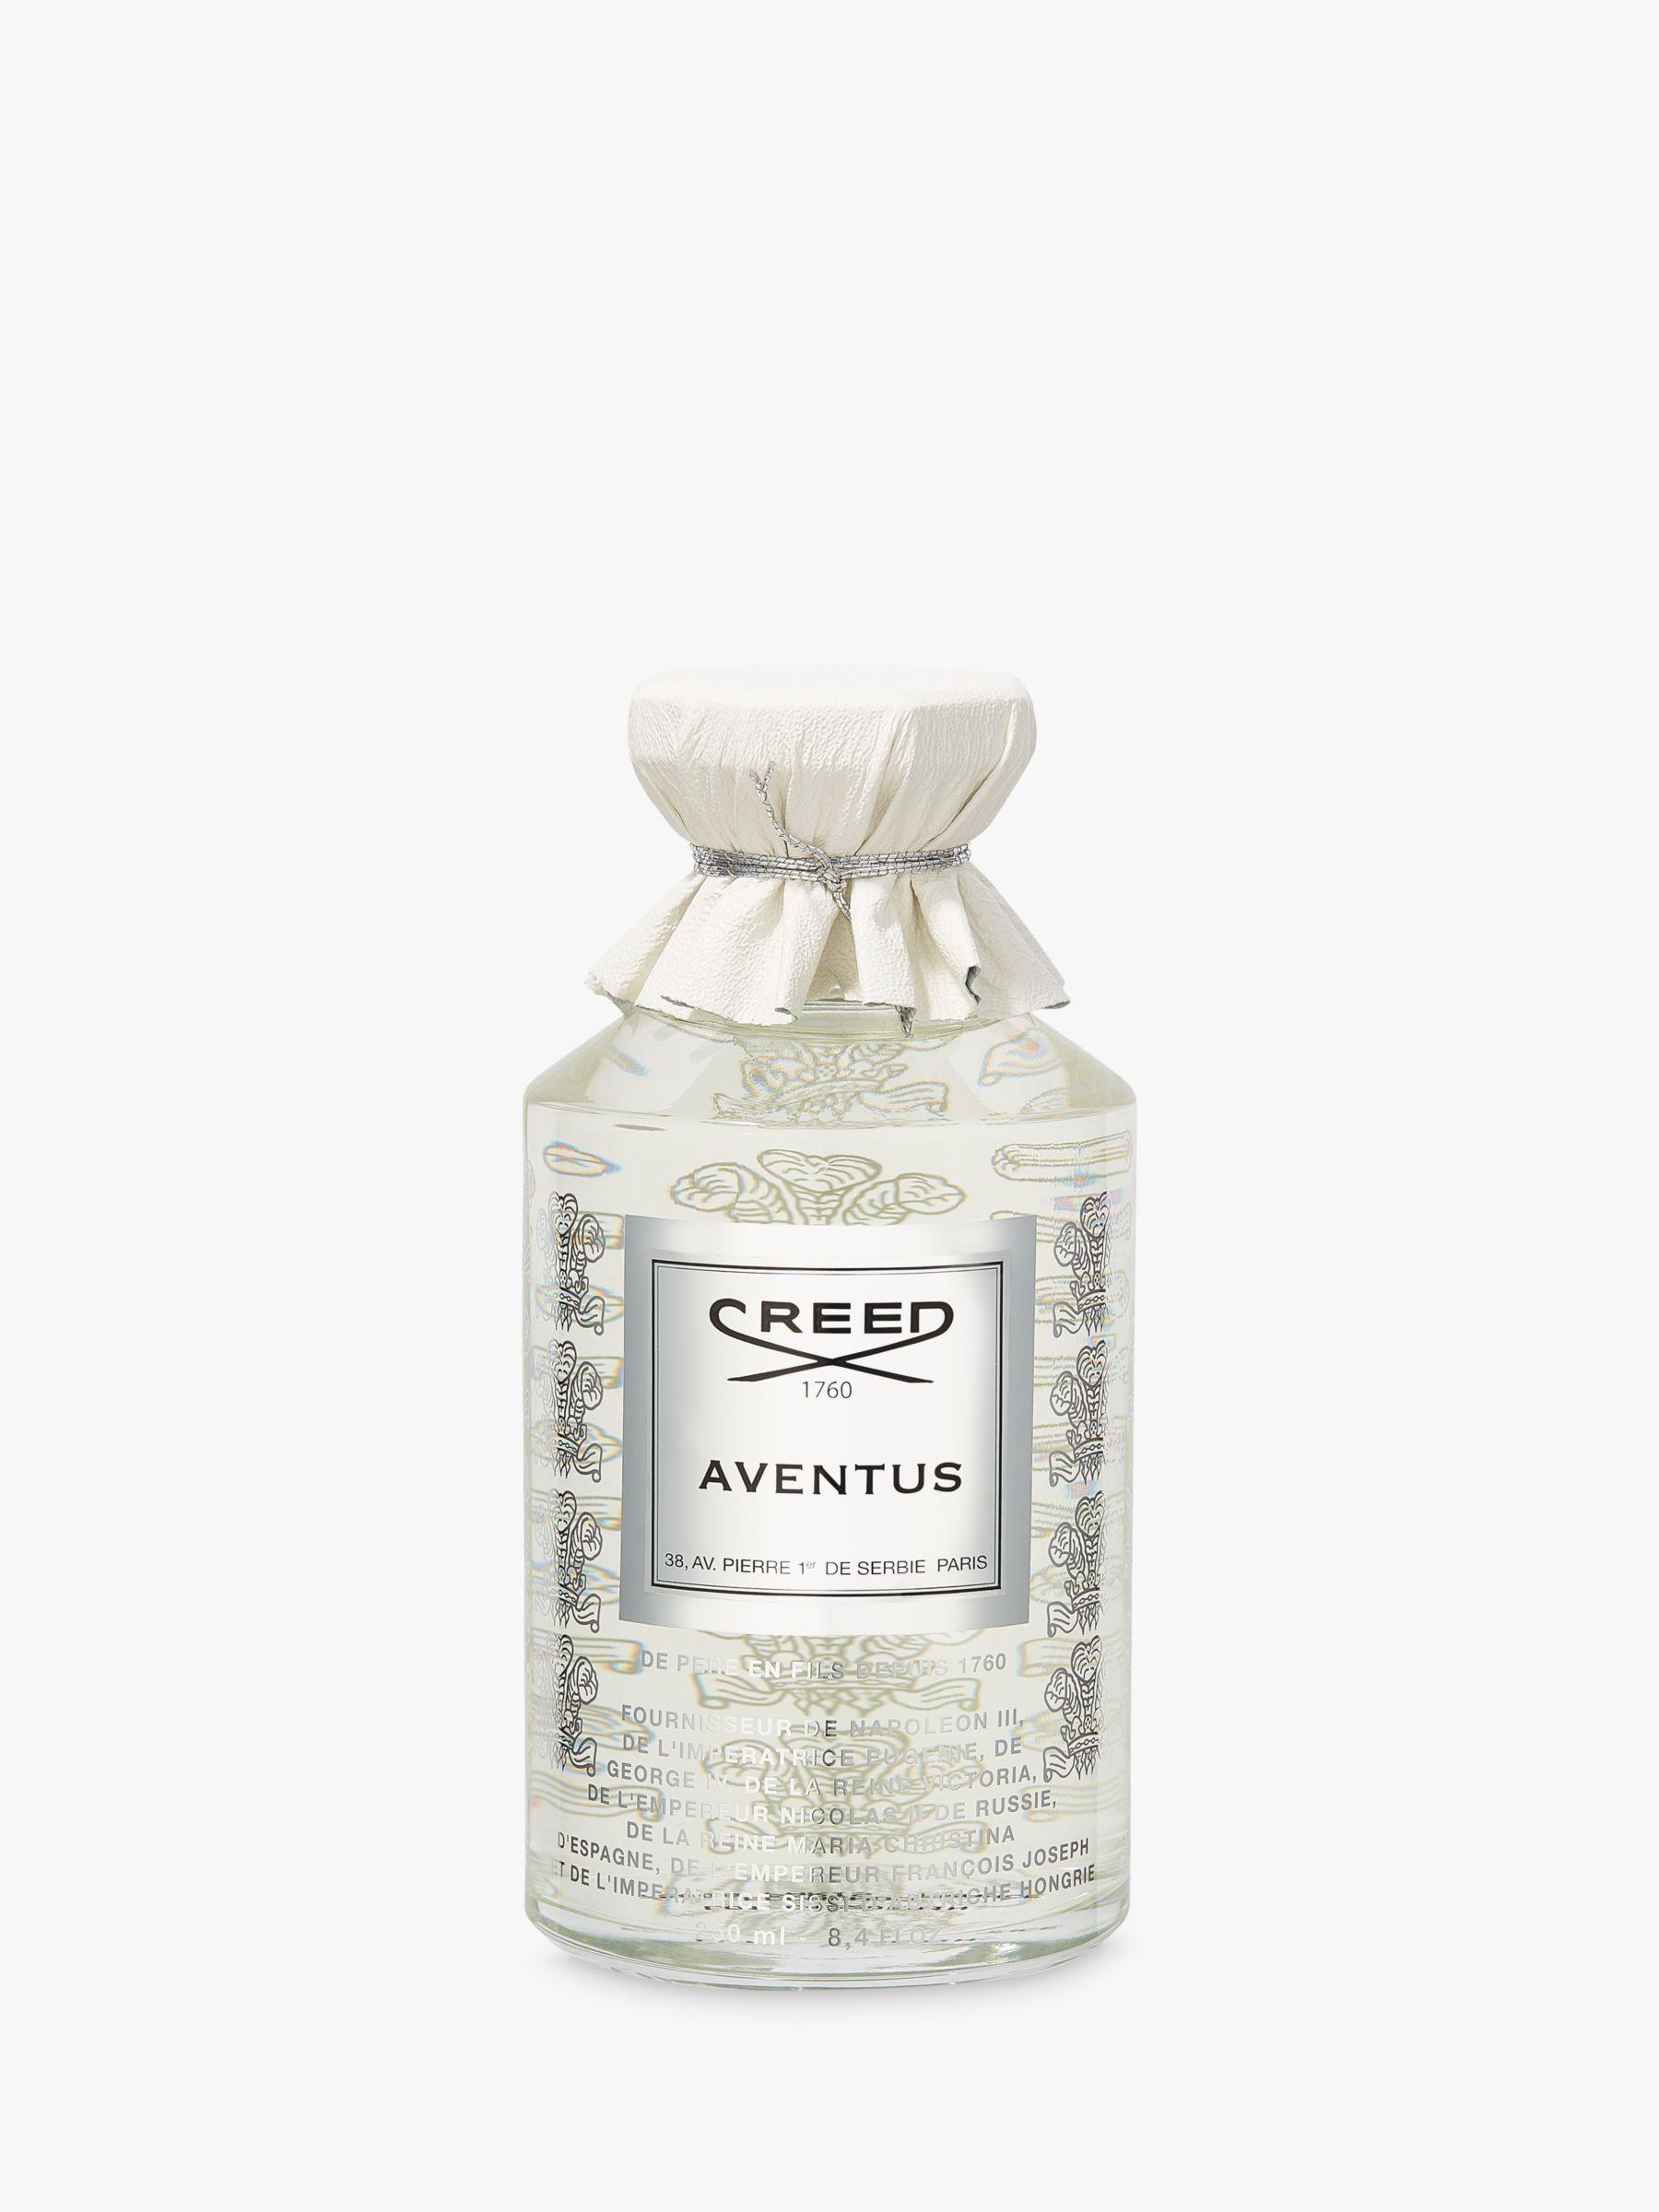 Creed CREED Aventus Eau de Parfum Flacon, 250ml